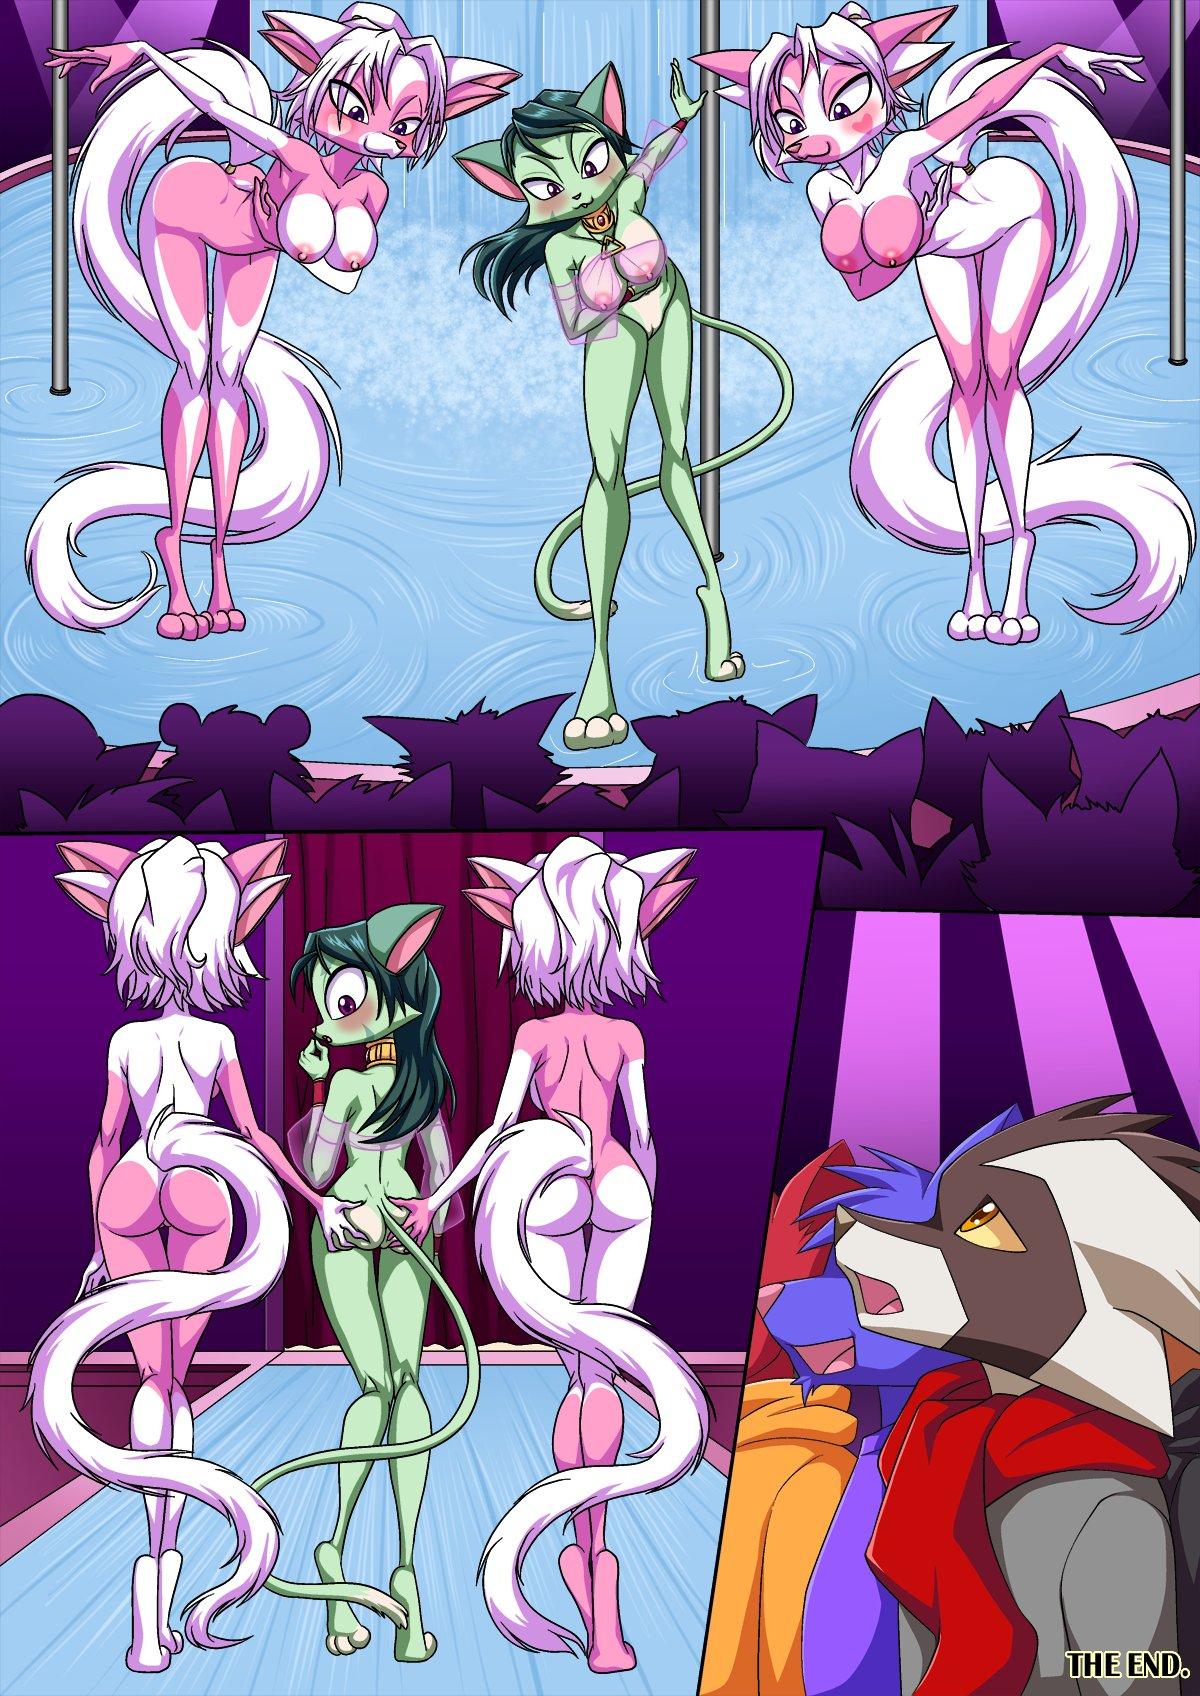 Furry strip game